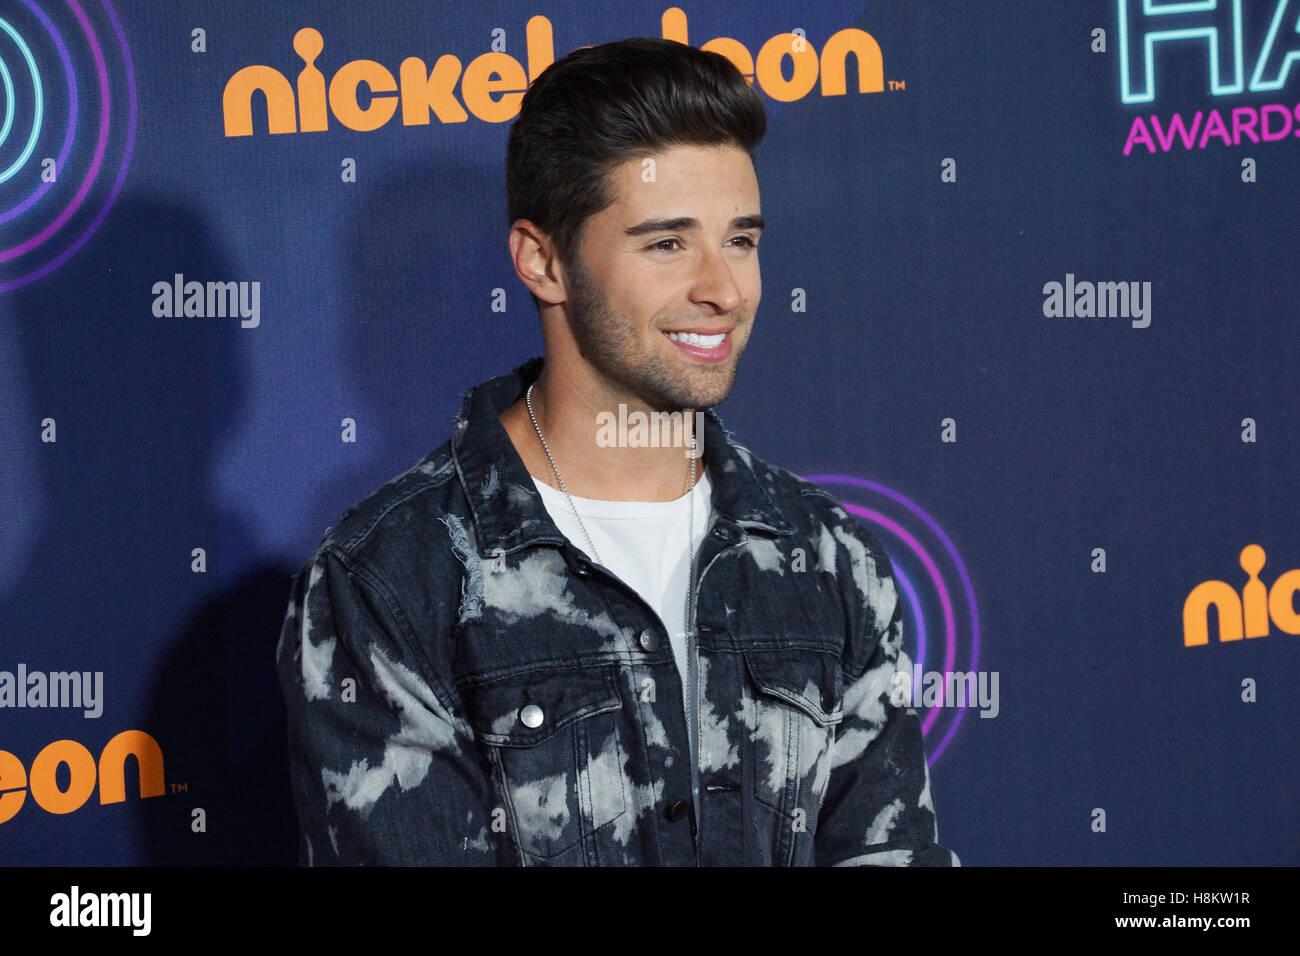 Jake Miller November 11, 2016 at The Nickelodeon HALO Awards at Pier 36 in New York, NY. - Stock Image